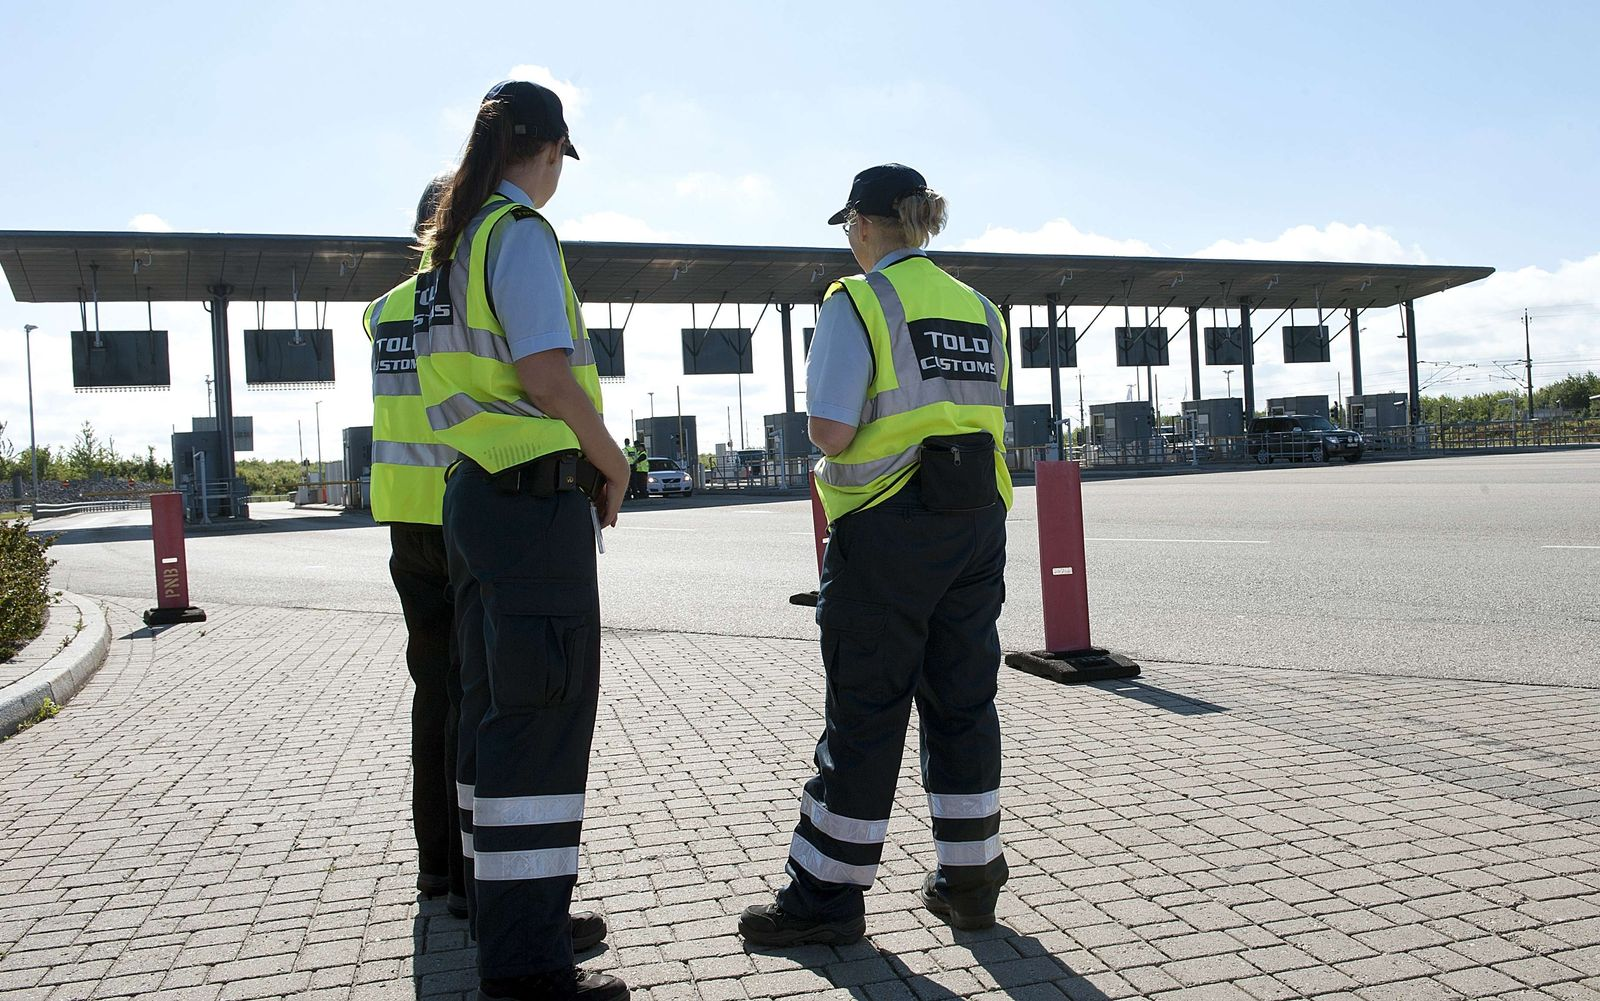 Grenze Dänemark/ Kontrollen